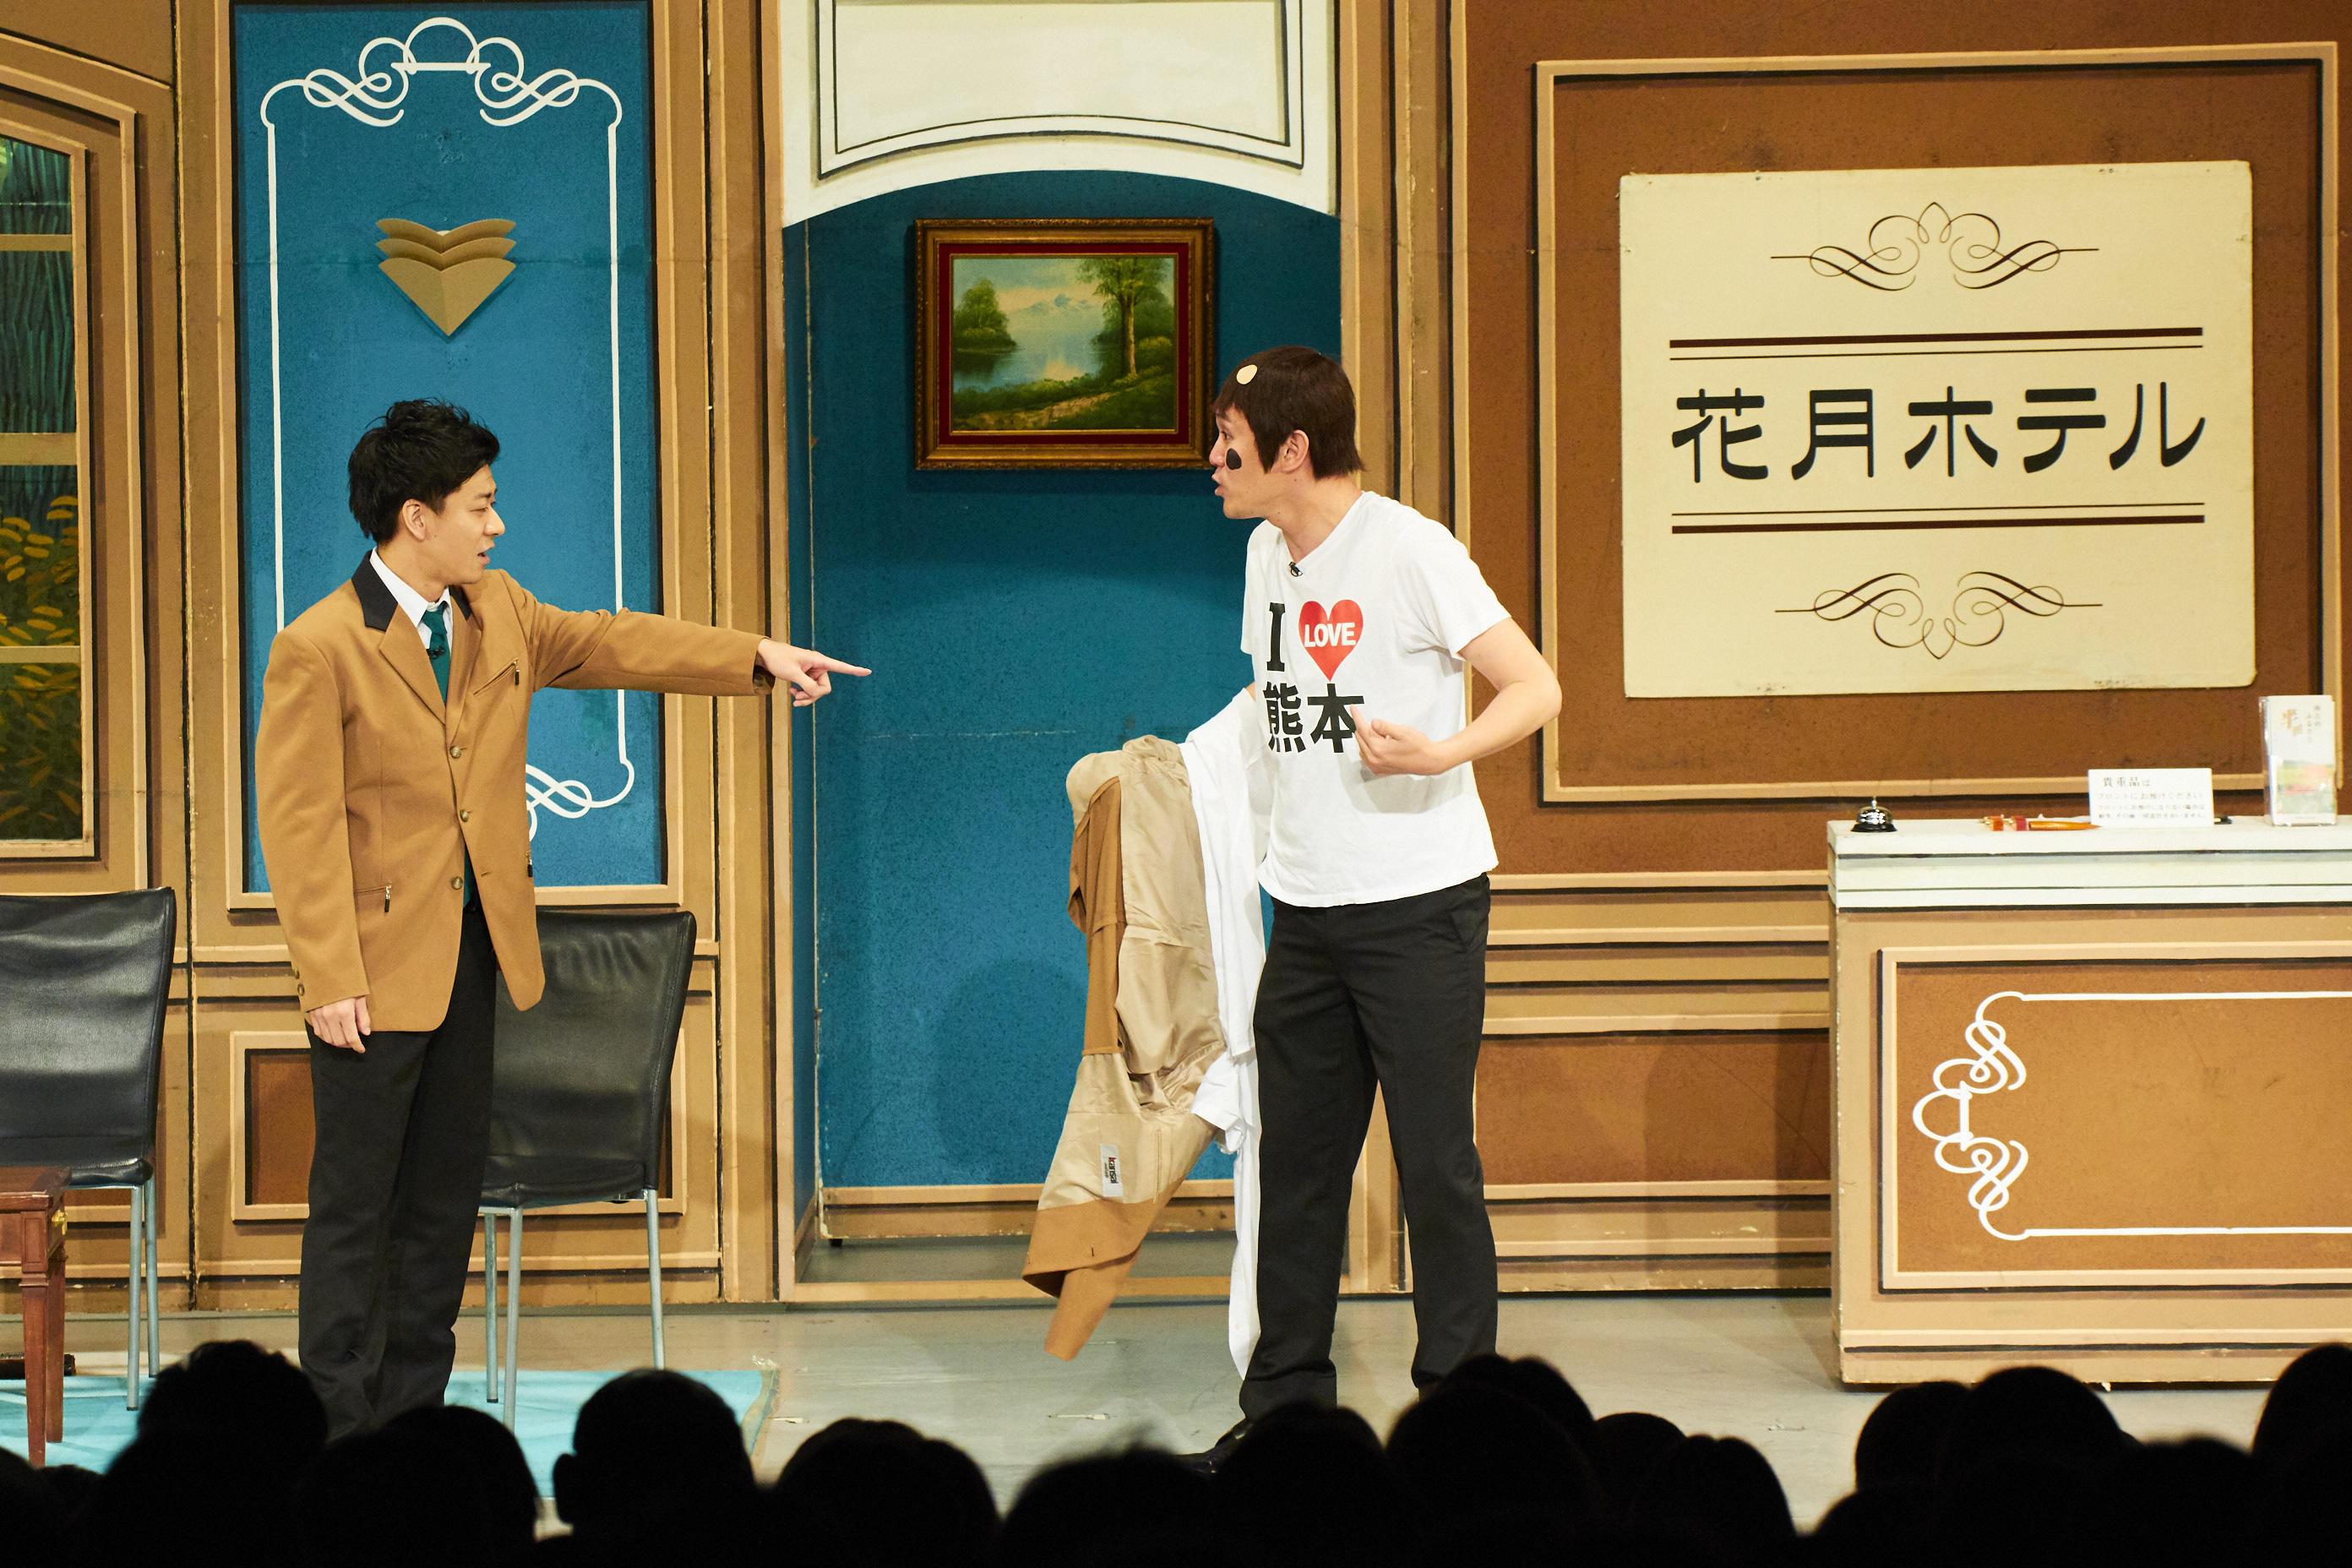 http://news.yoshimoto.co.jp/20180516003632-fc7dd91217c7dc4c7ebf2af050bed0868fb092fe.jpg